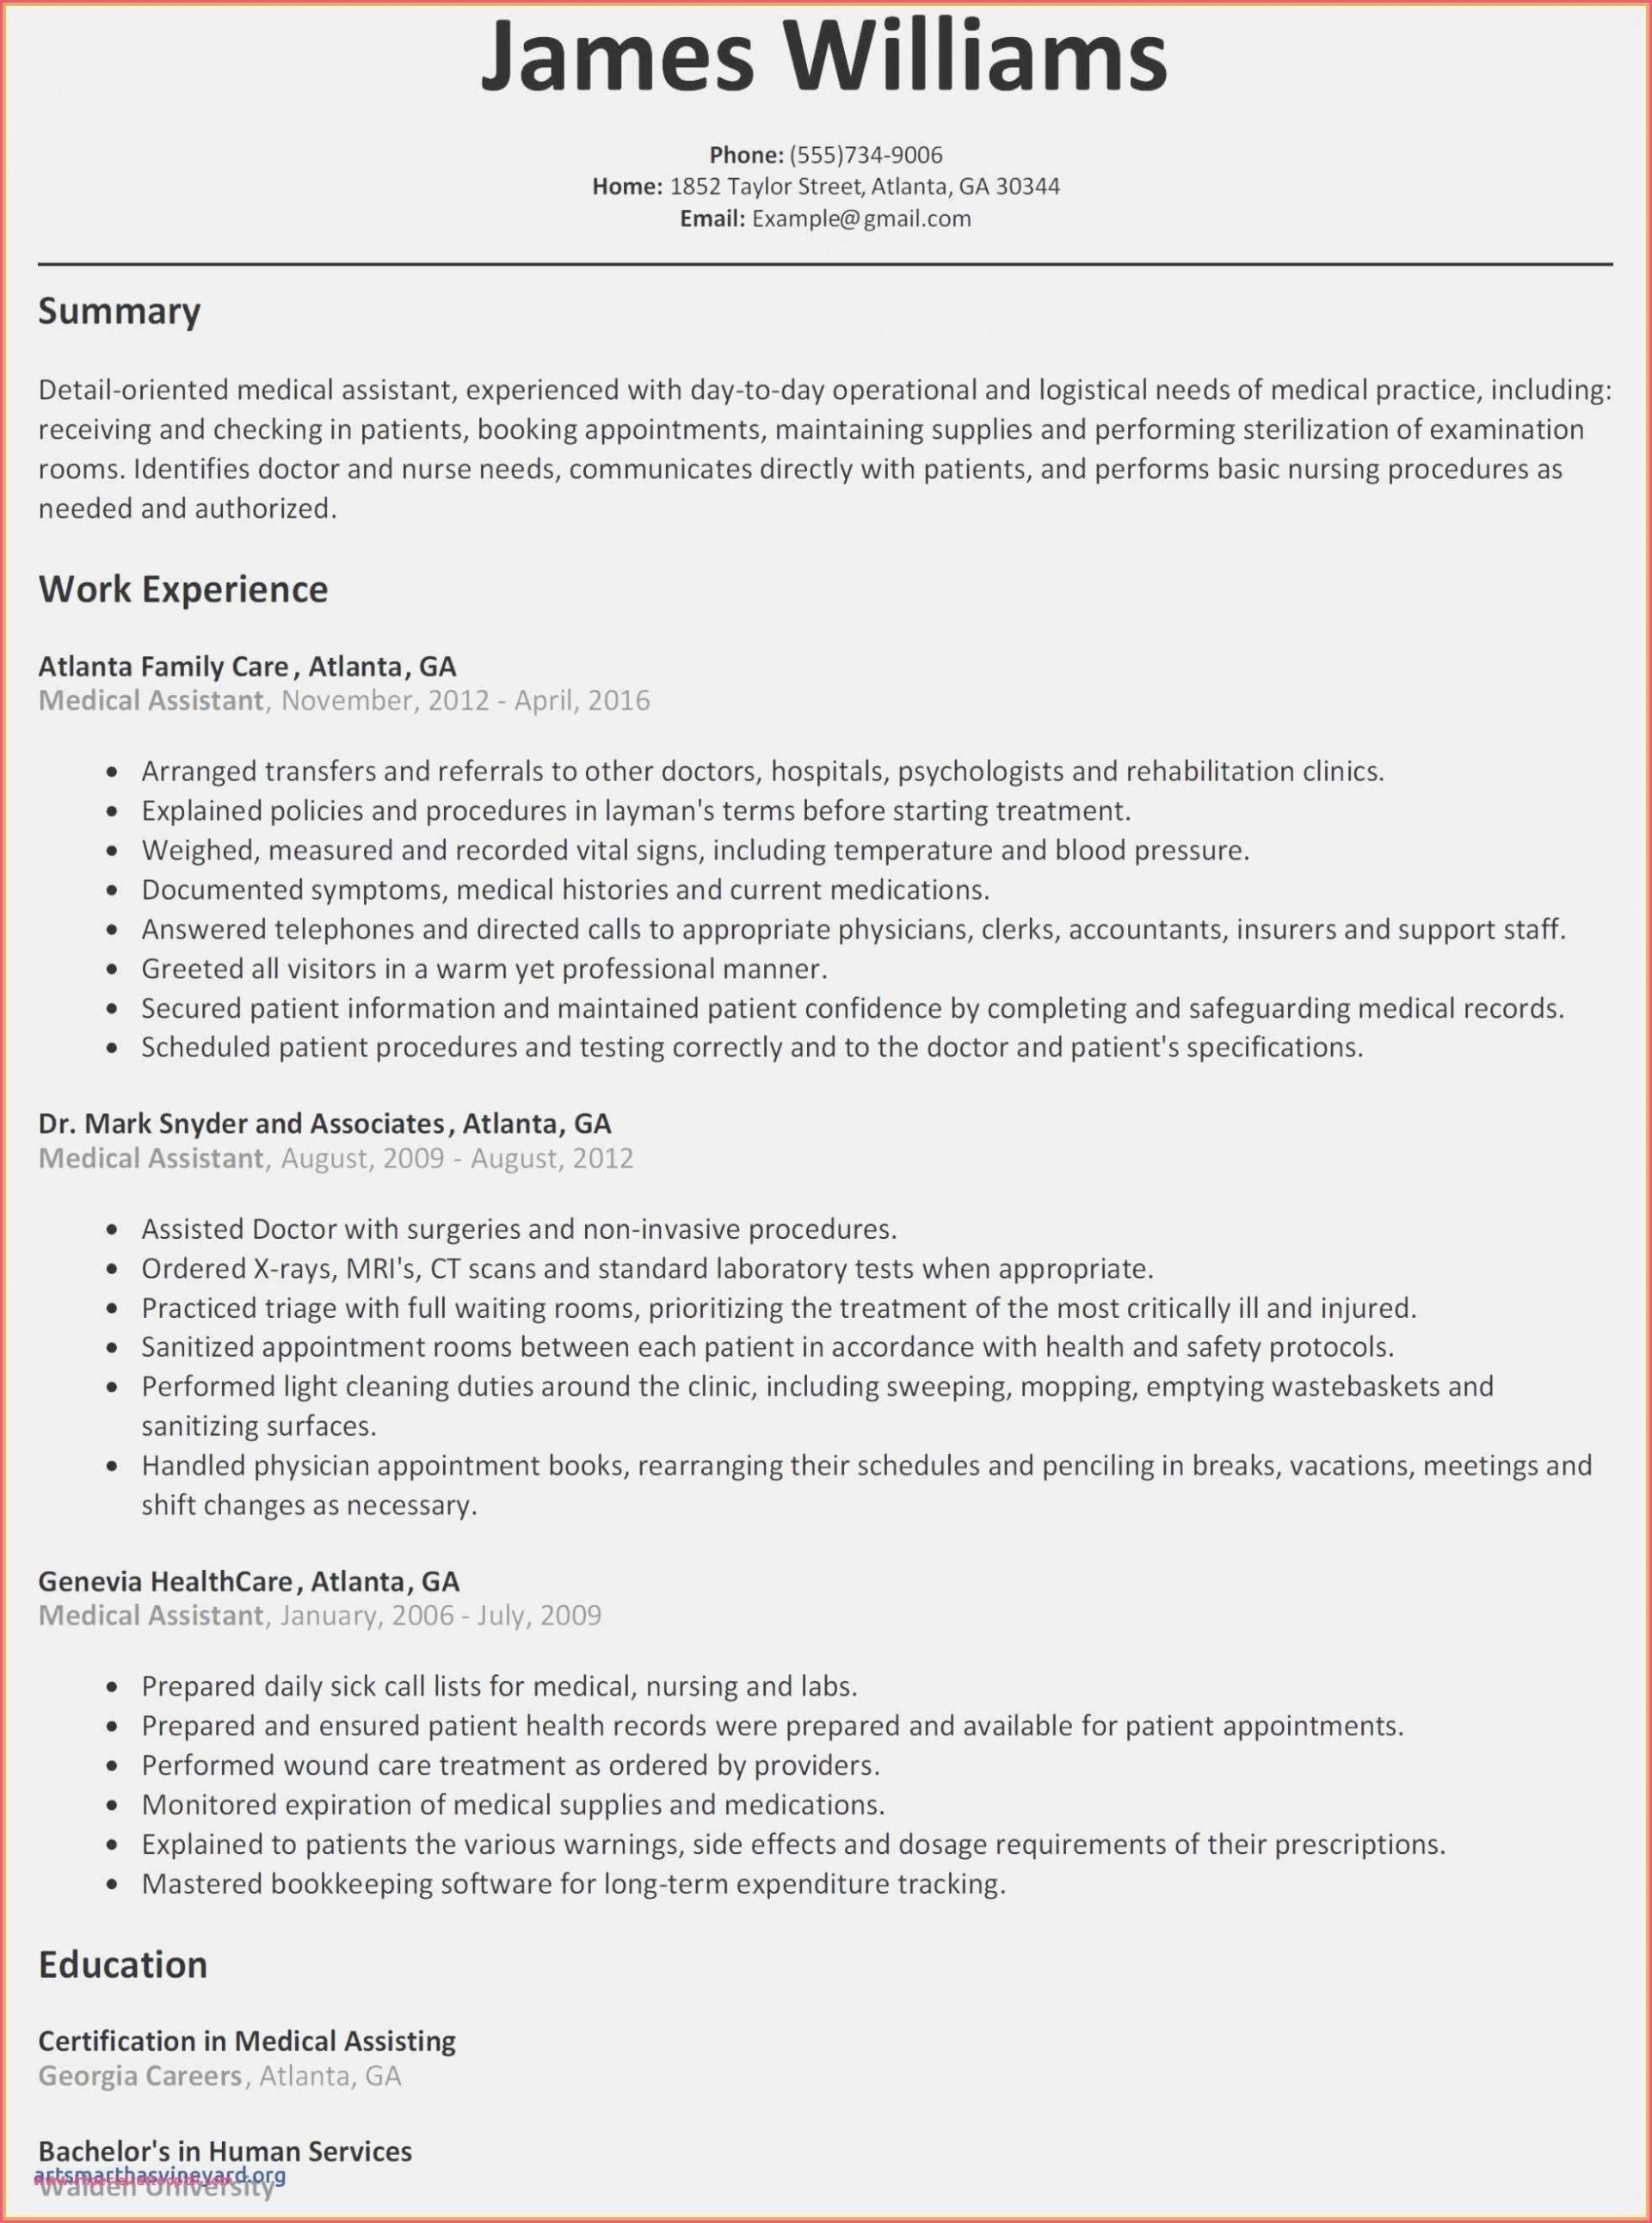 federal resume template 025 best microsoft word federal